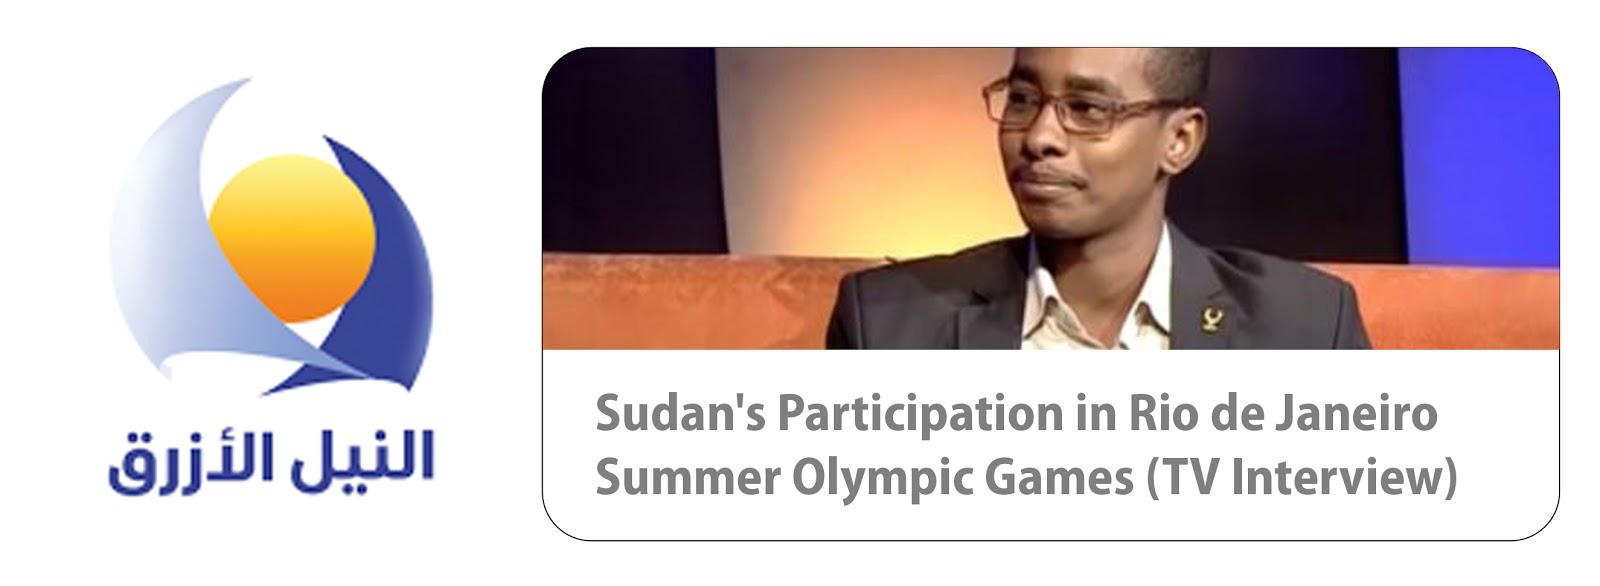 Ambassador Saeed Interview on Blue Nile TV